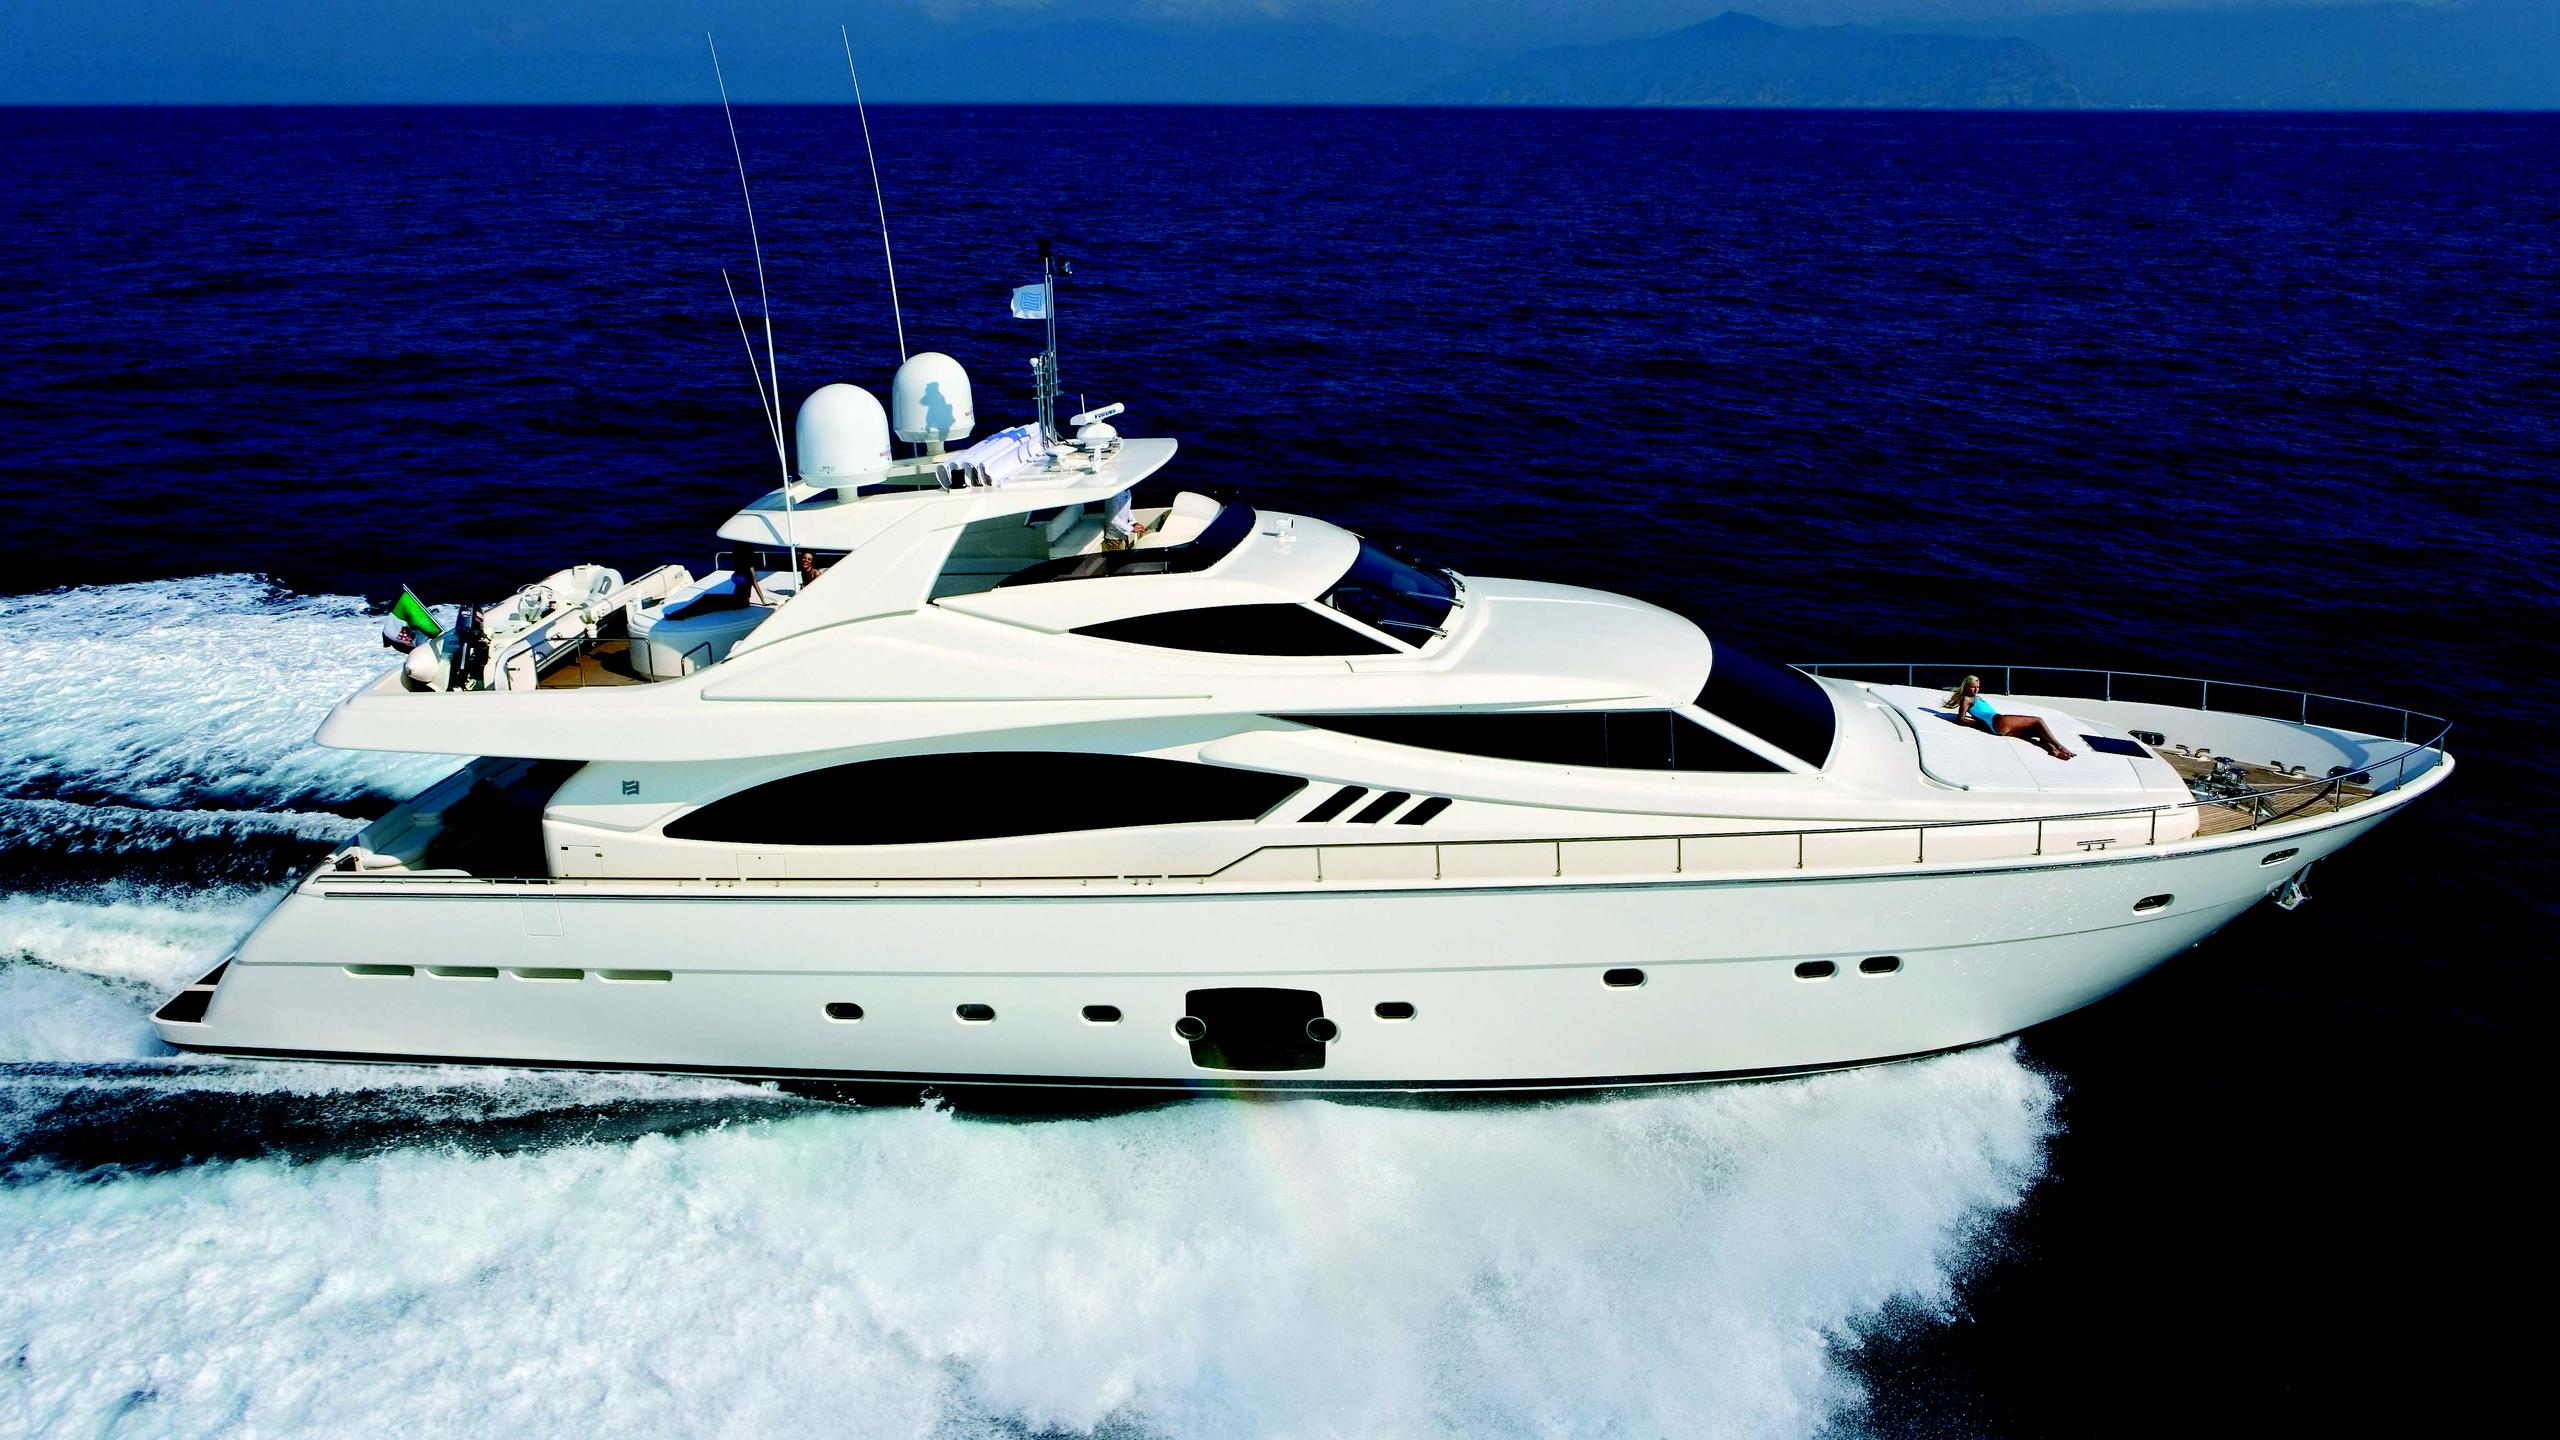 ferretti-881-24-motor-yacht-ferretti-881-rph-2007-27m-cruising